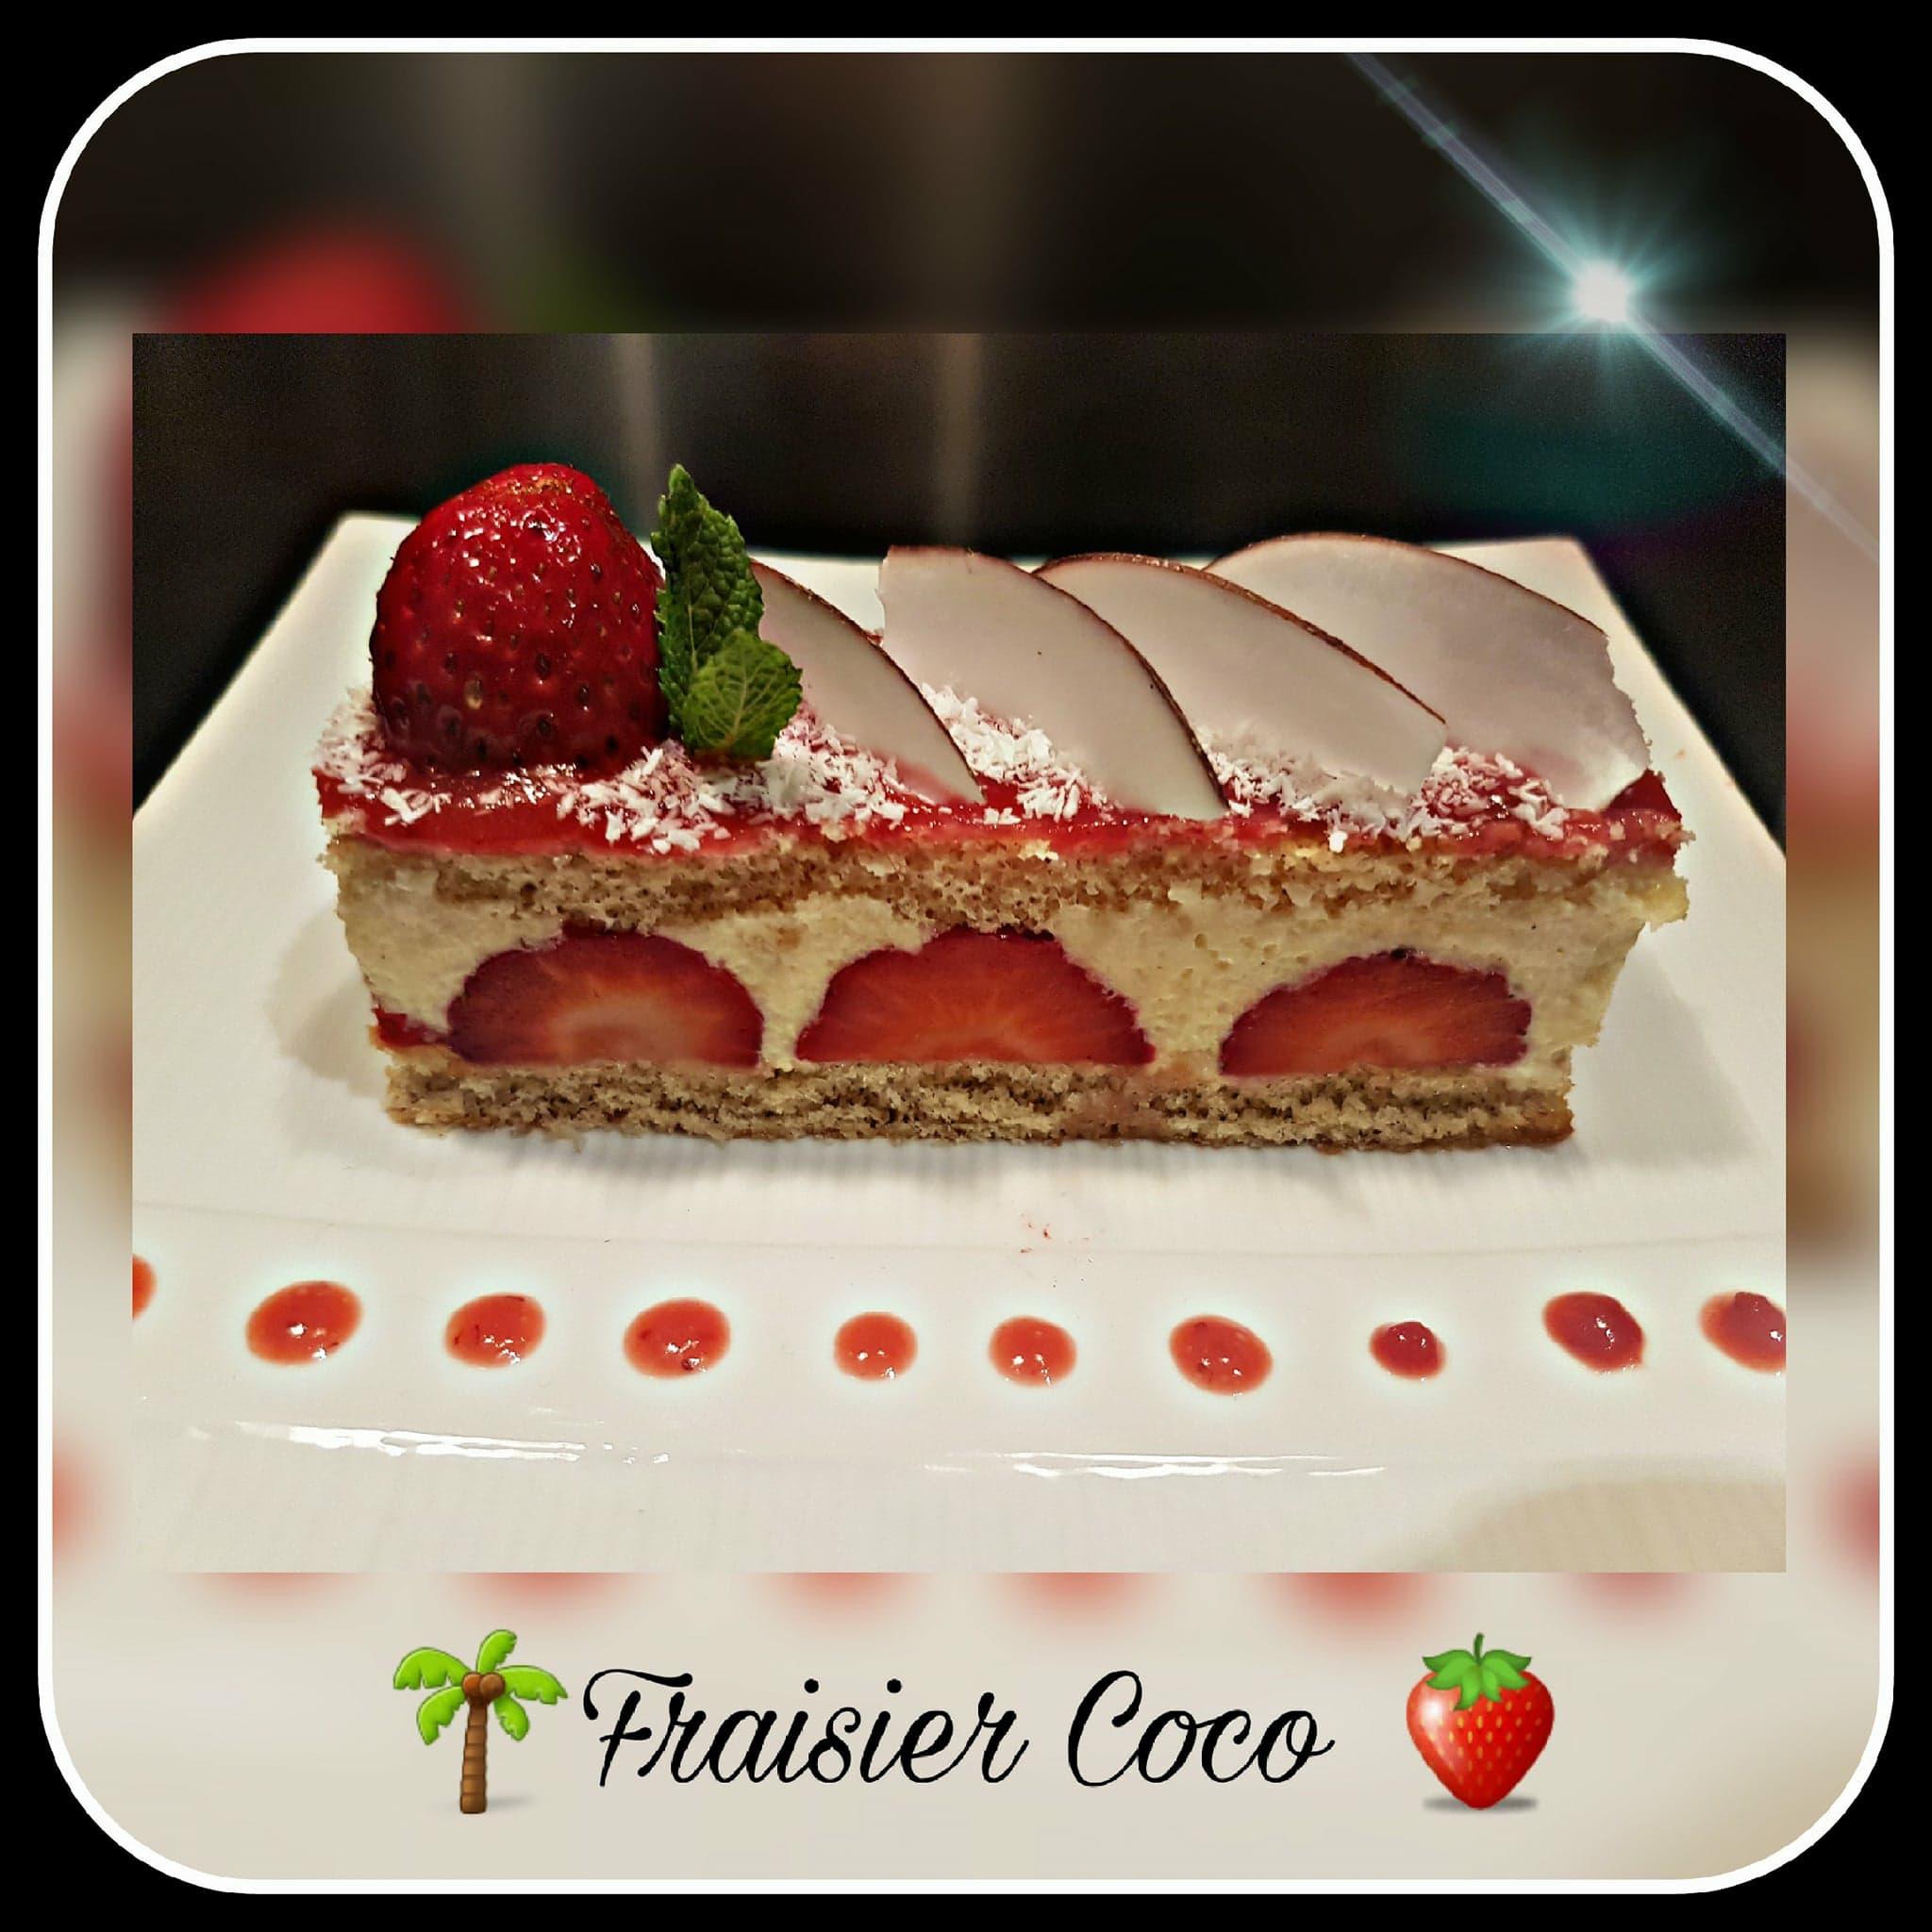 fraisier coco